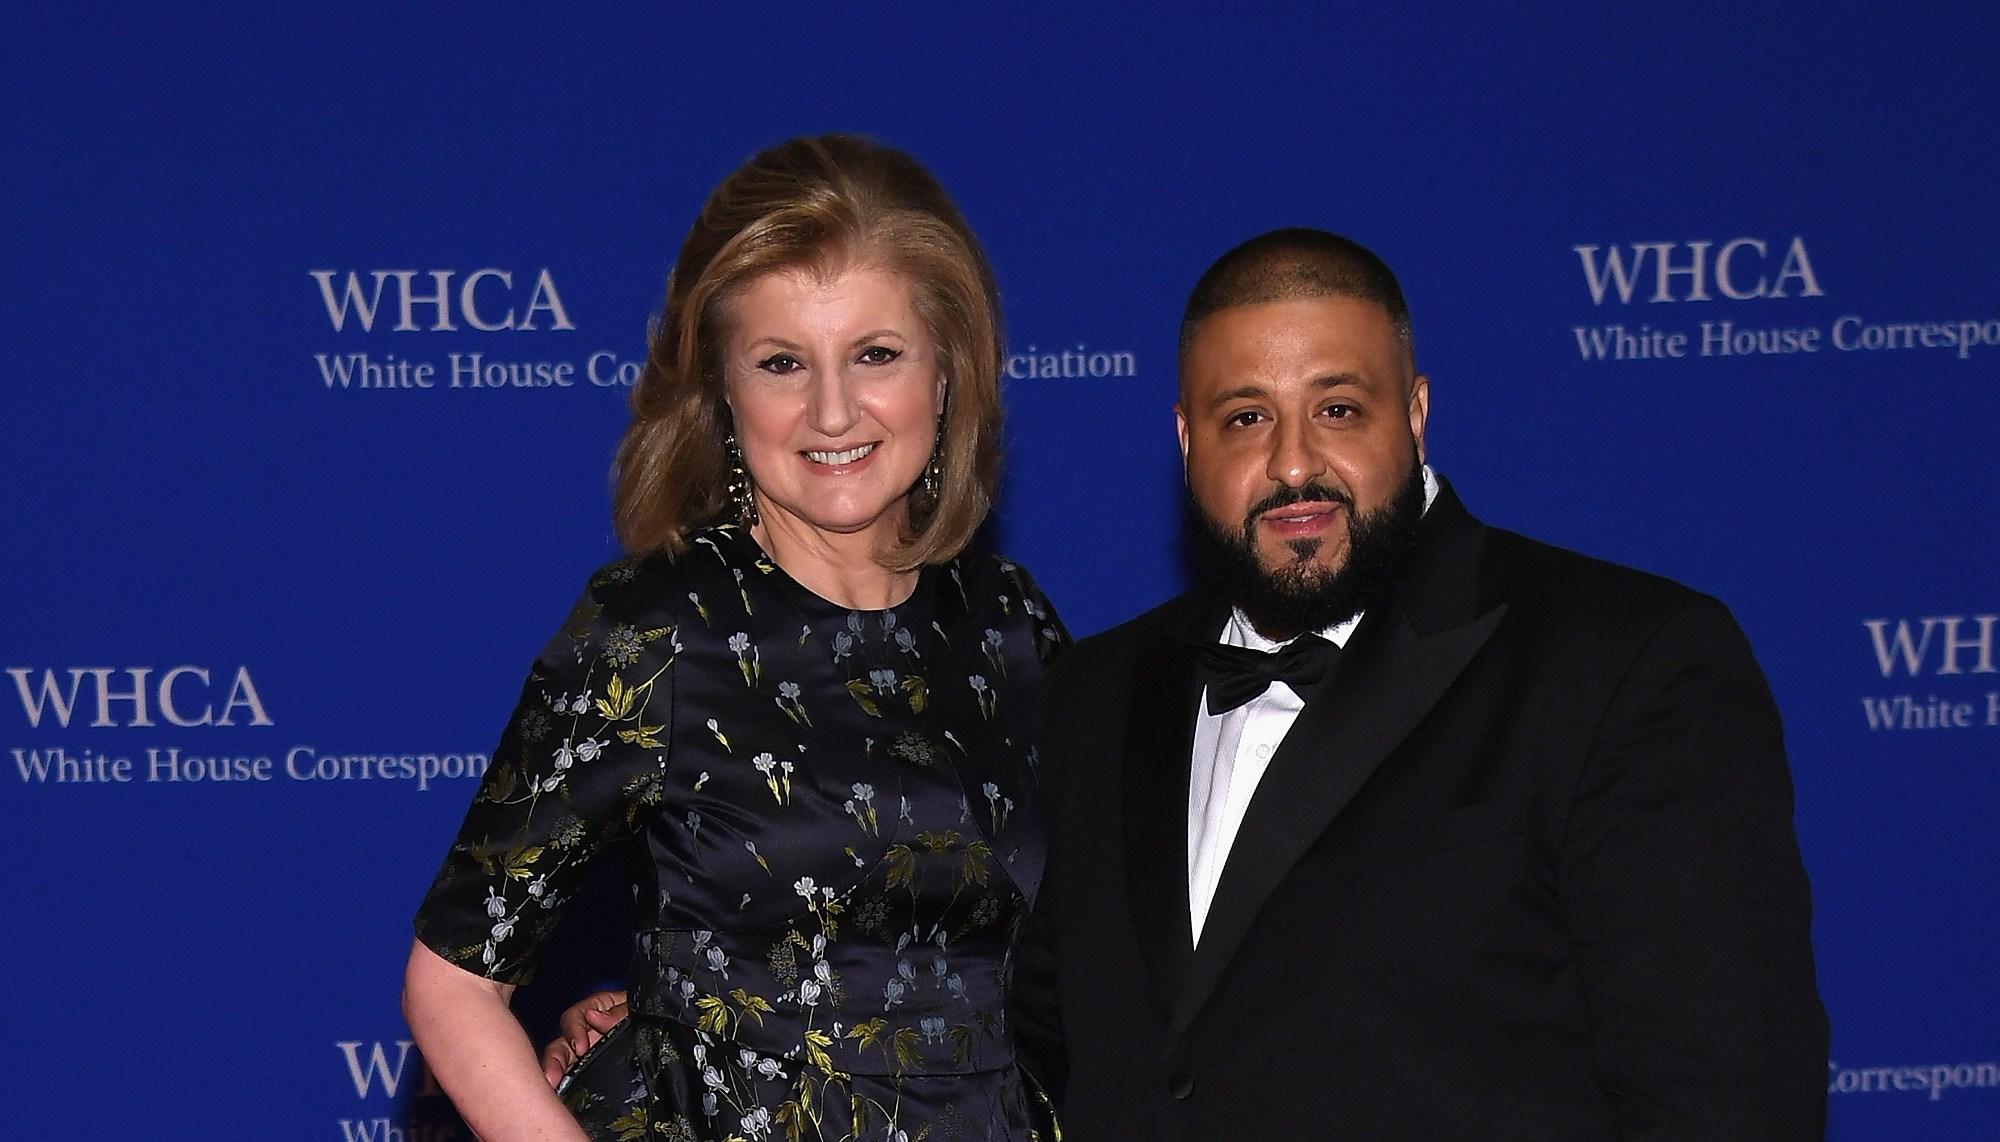 102nd White House Correspondents' Association Dinner - Arrivals